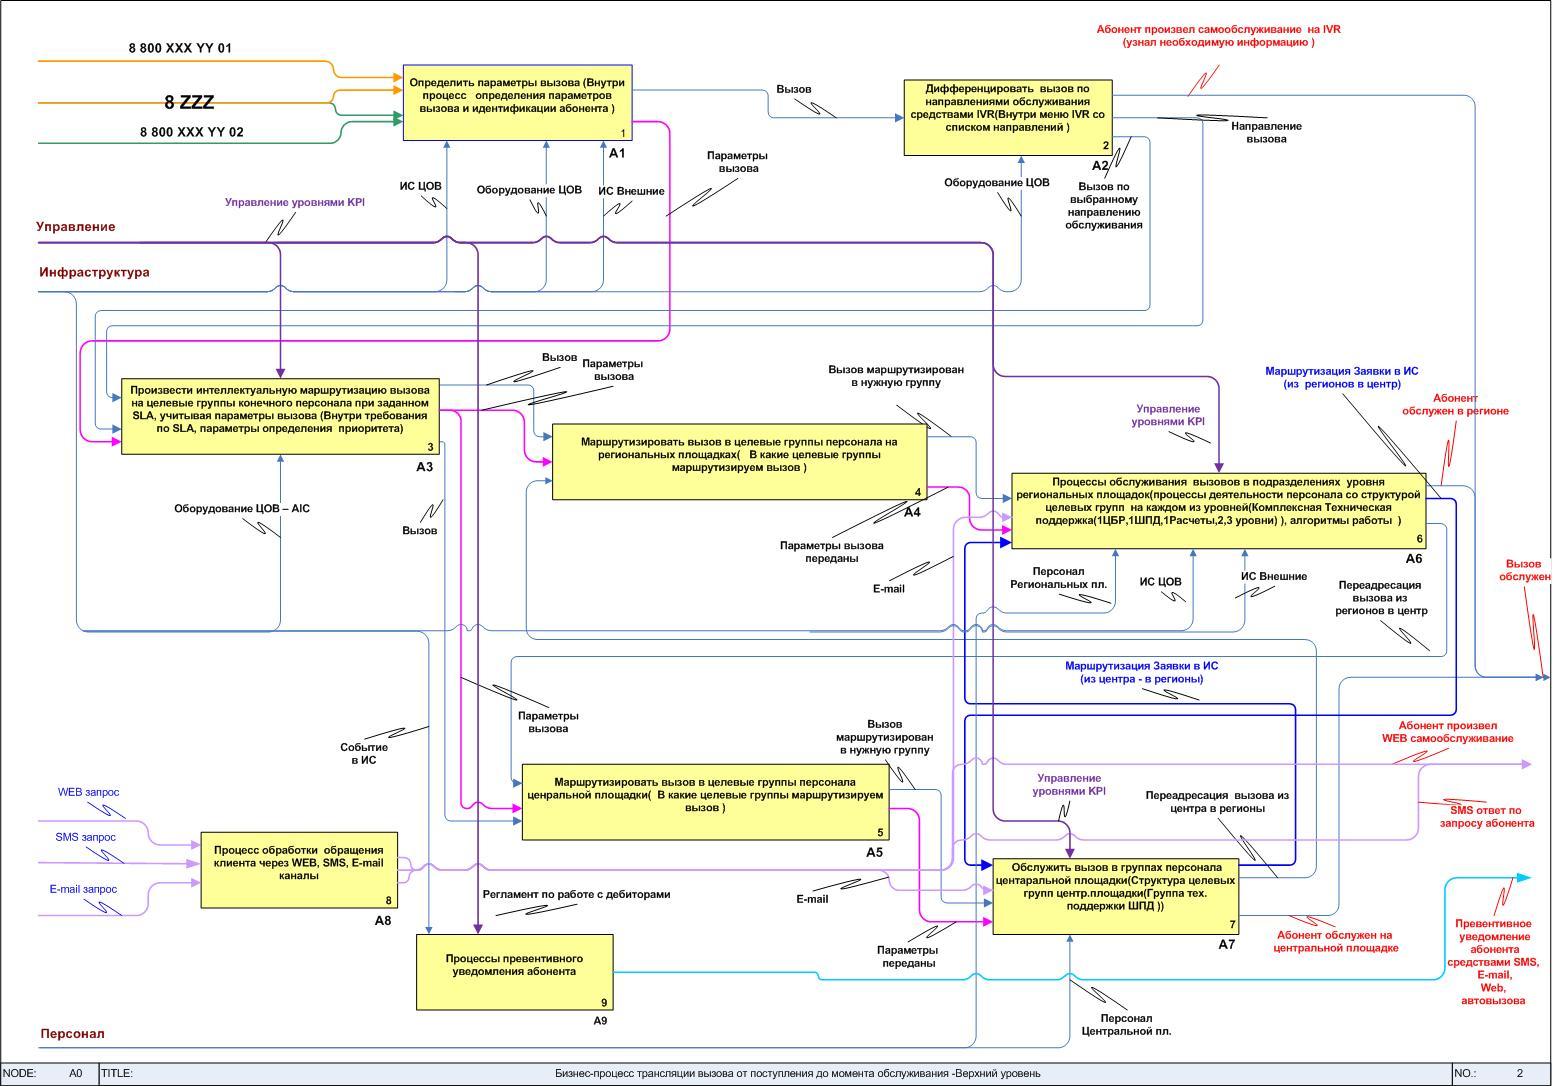 Создание схема бизнес процесса